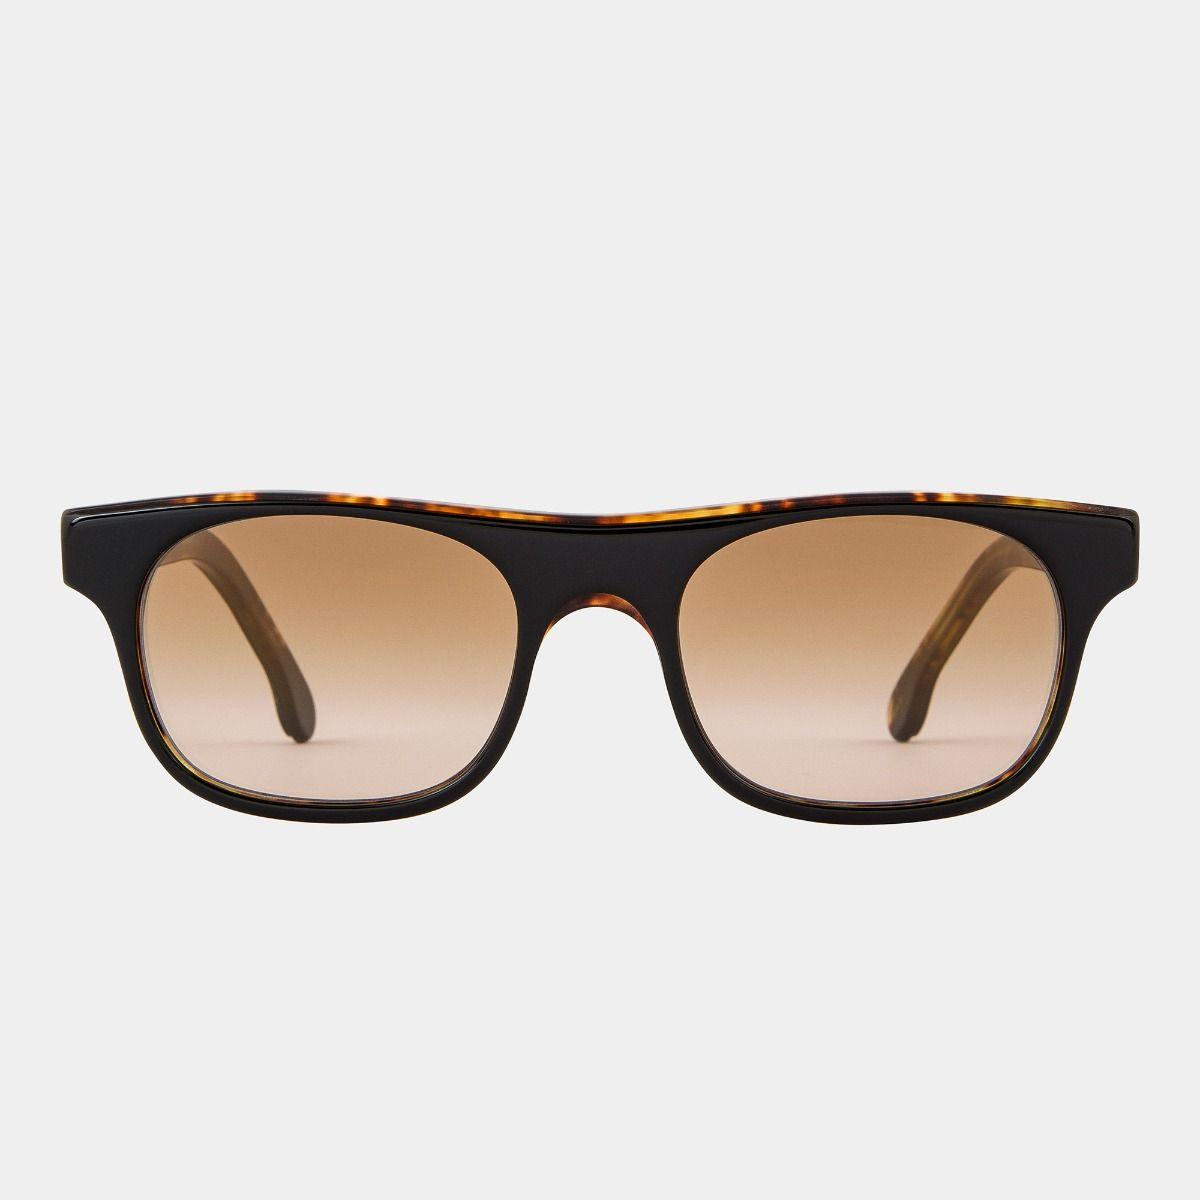 Paul Smith Bernard Rectangle Sunglasses